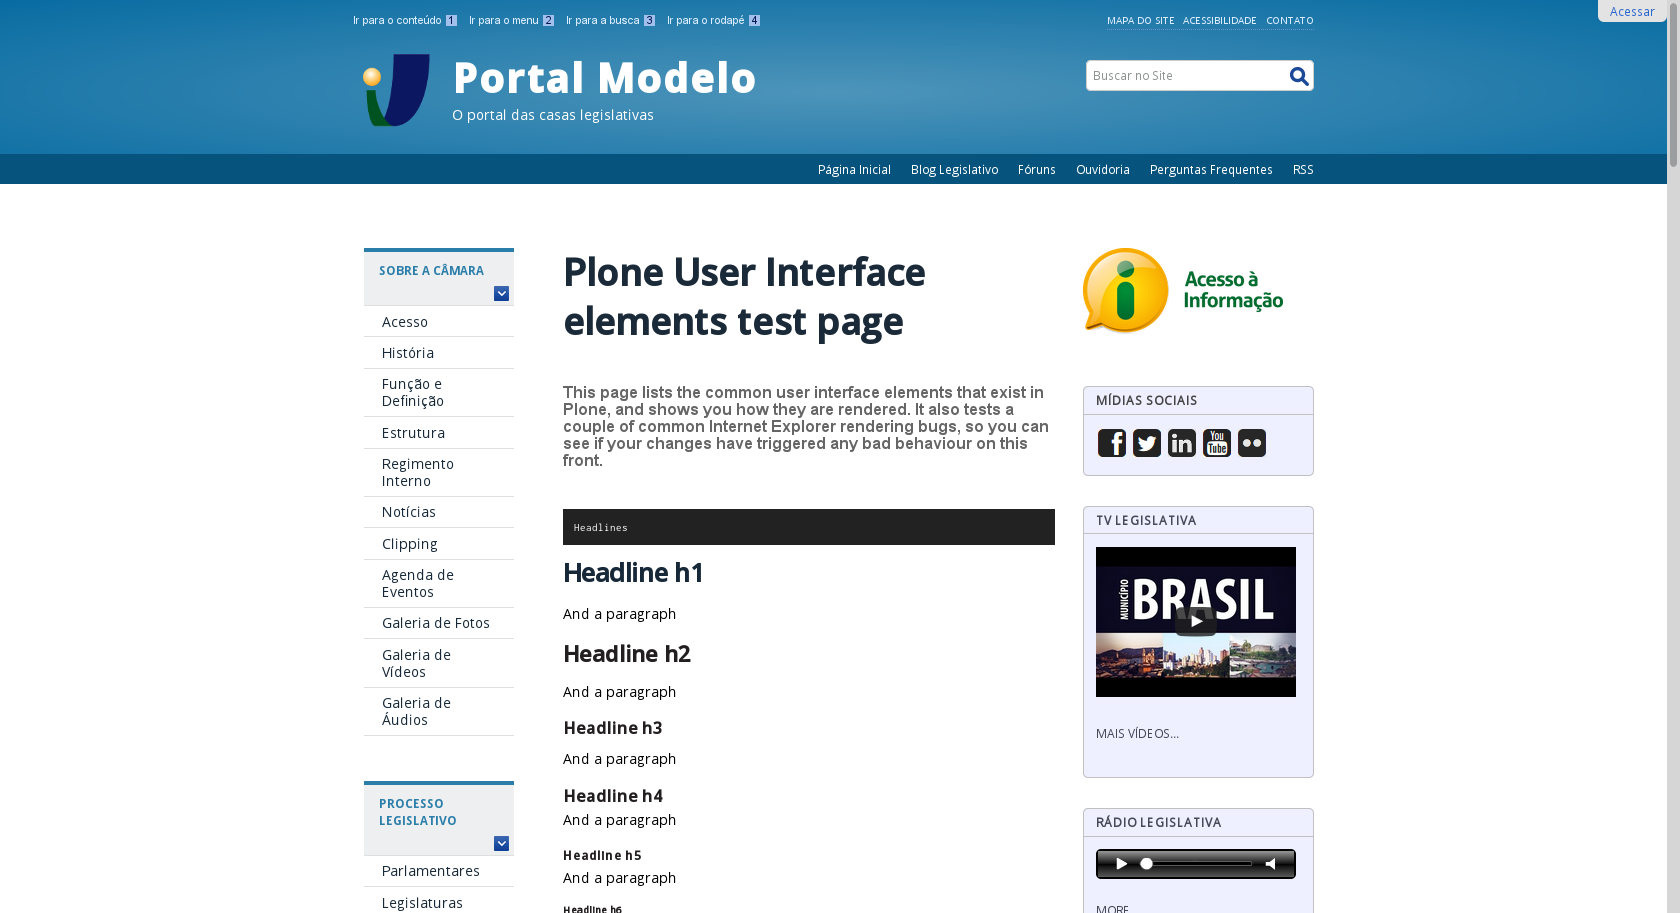 https://raw.githubusercontent.com/interlegis/interlegis.portalmodelo.theme/master/src/interlegis/portalmodelo/theme/themes/IDG-azul-11/preview.png